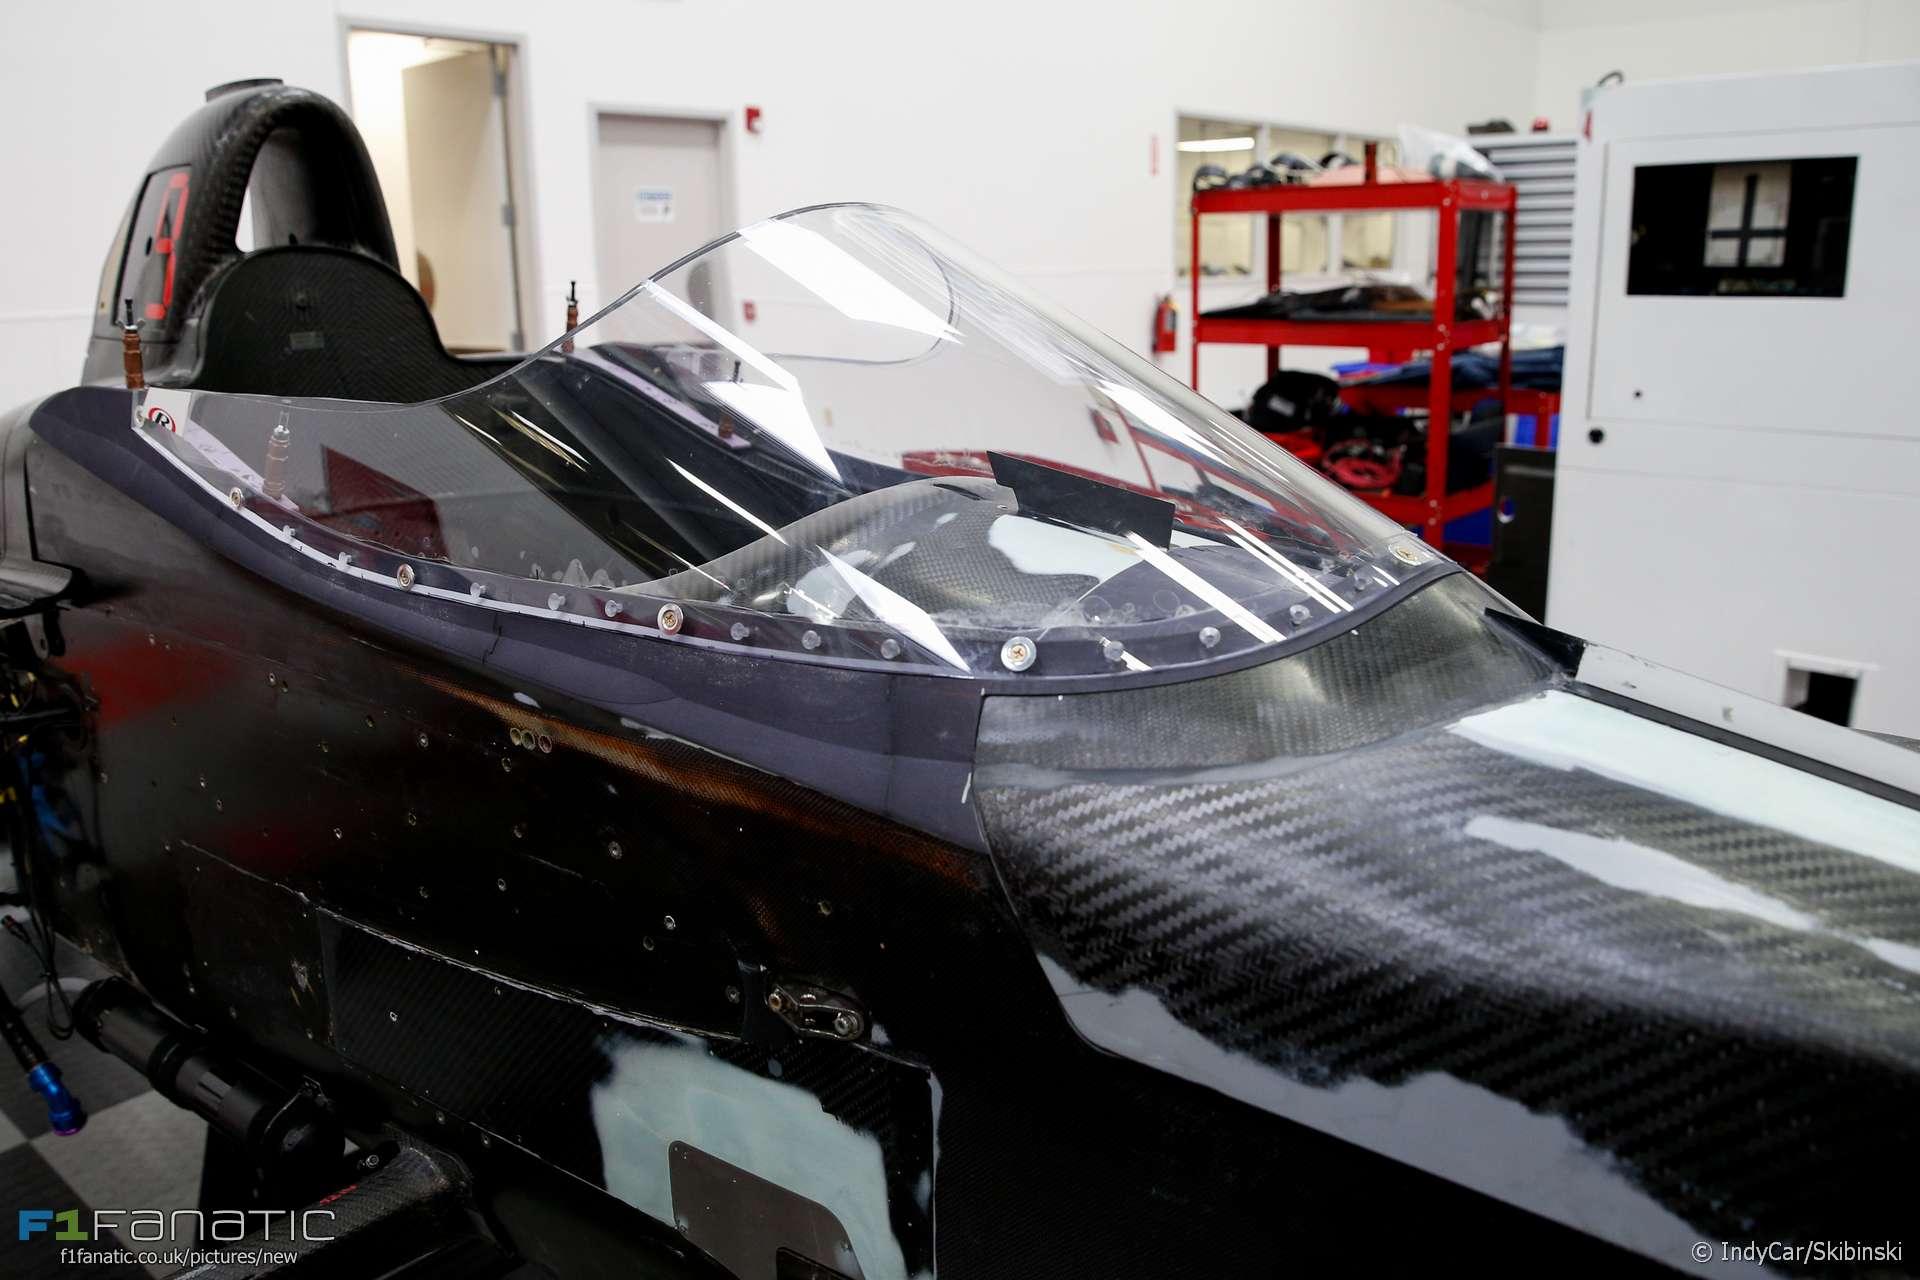 IndyCar windscreen, 2018